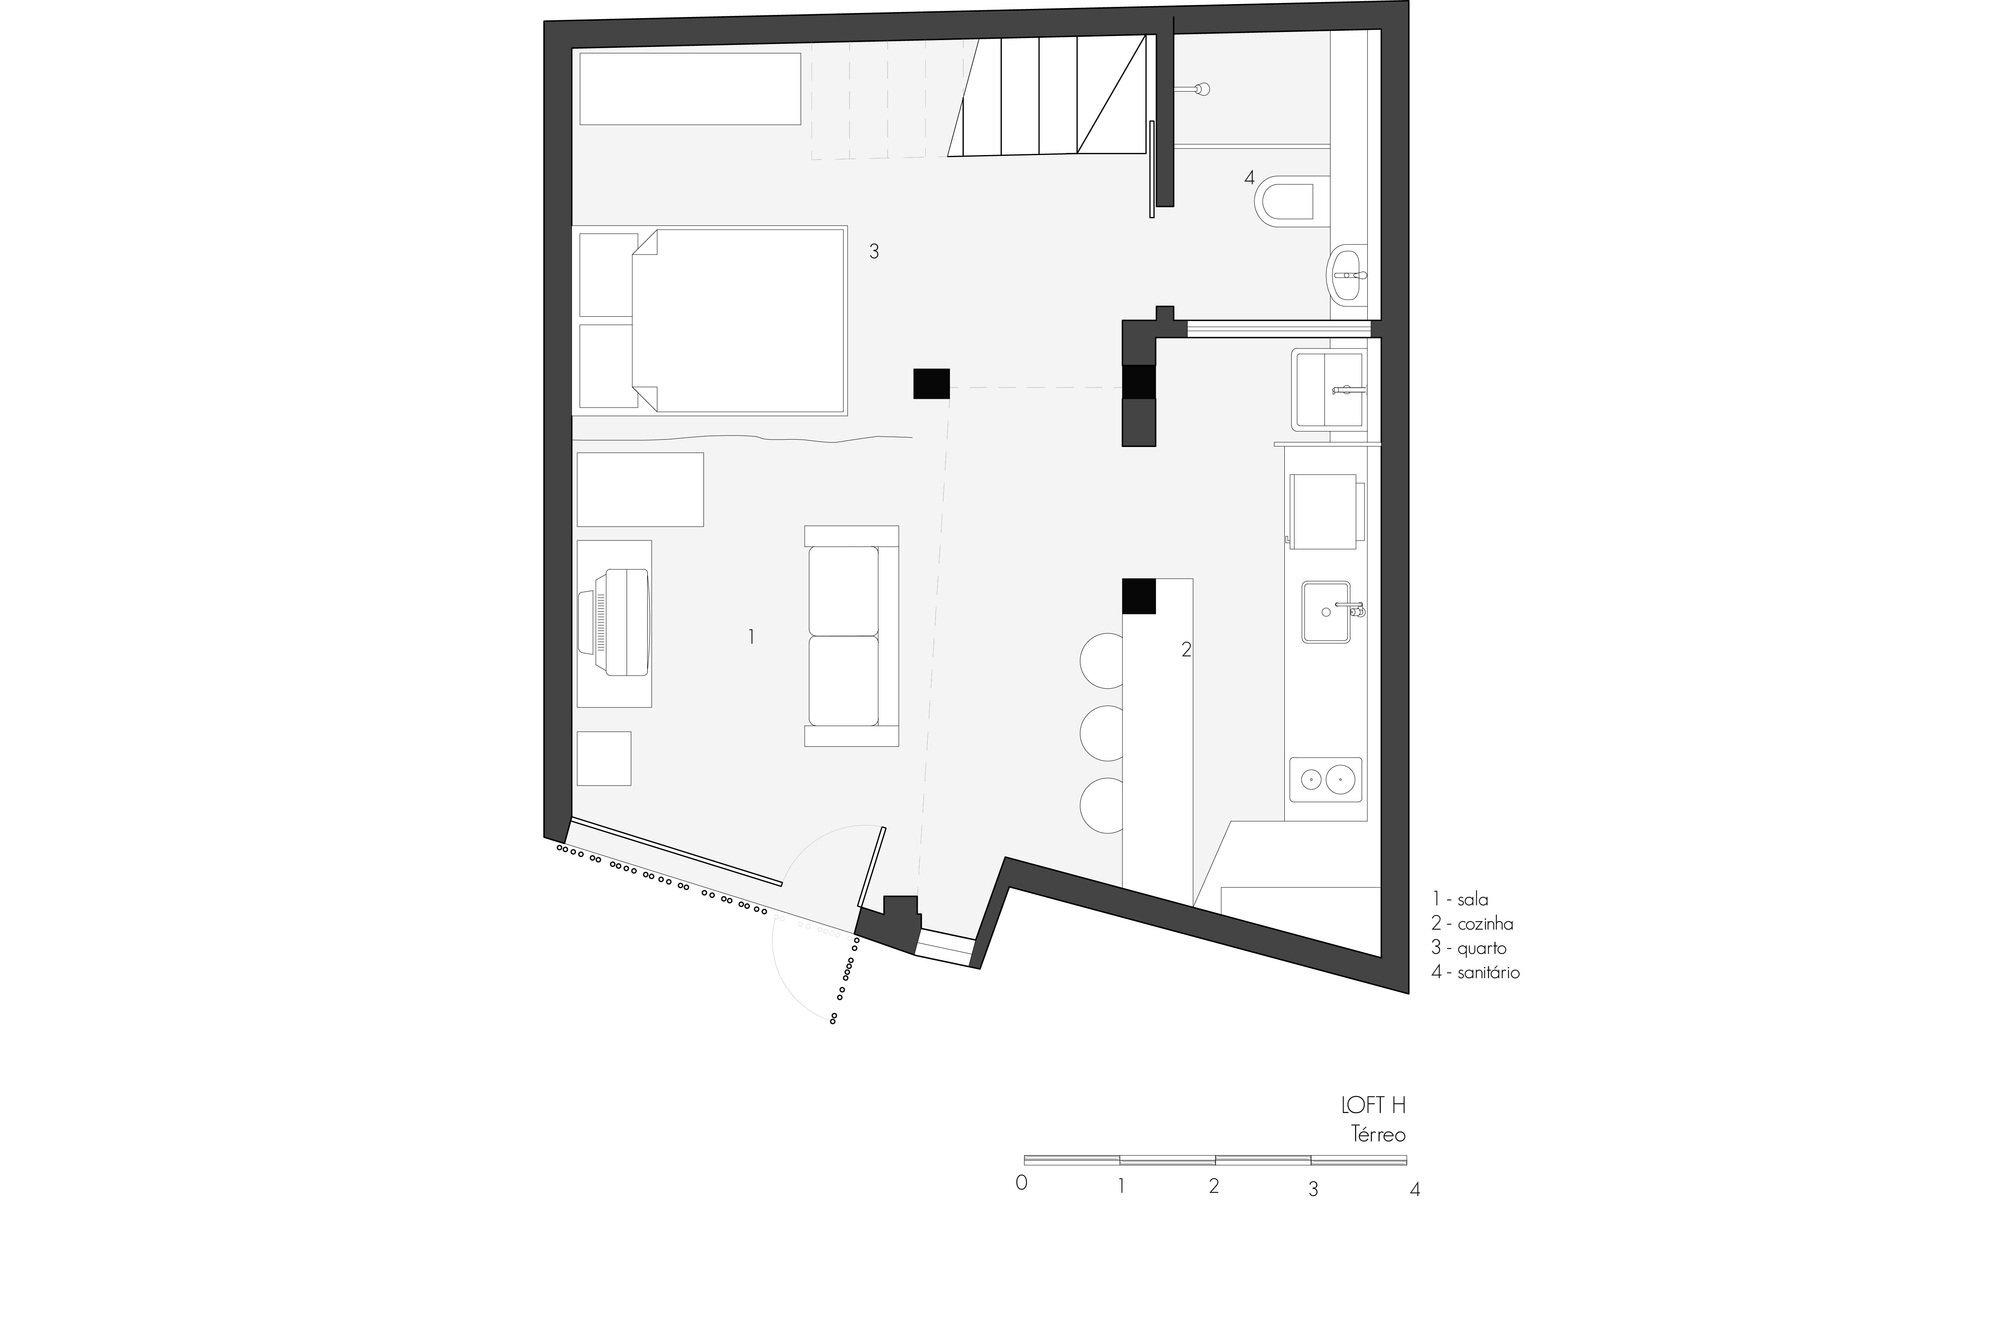 Loft Grandpa - MEIUS Arquitetura -  Brazil - First Floor Plan - Humble Homes